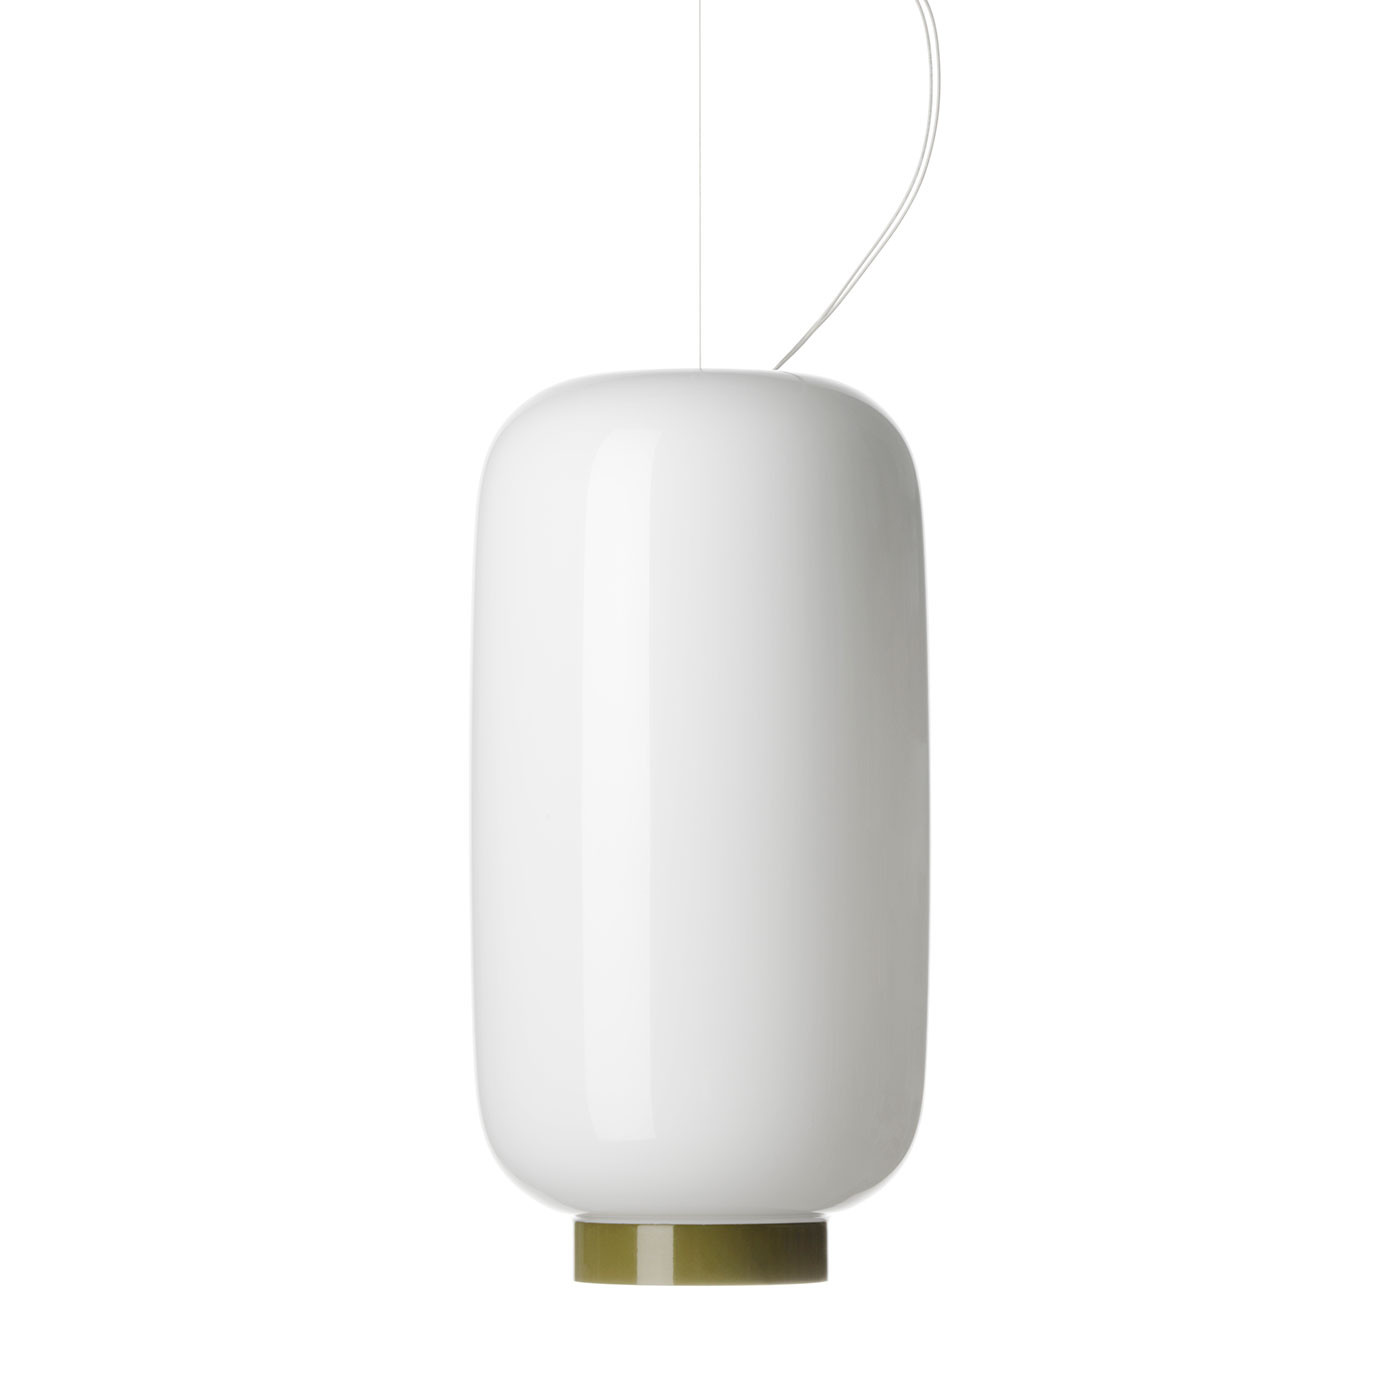 Foscarini Chouchin 2 Reverse LED